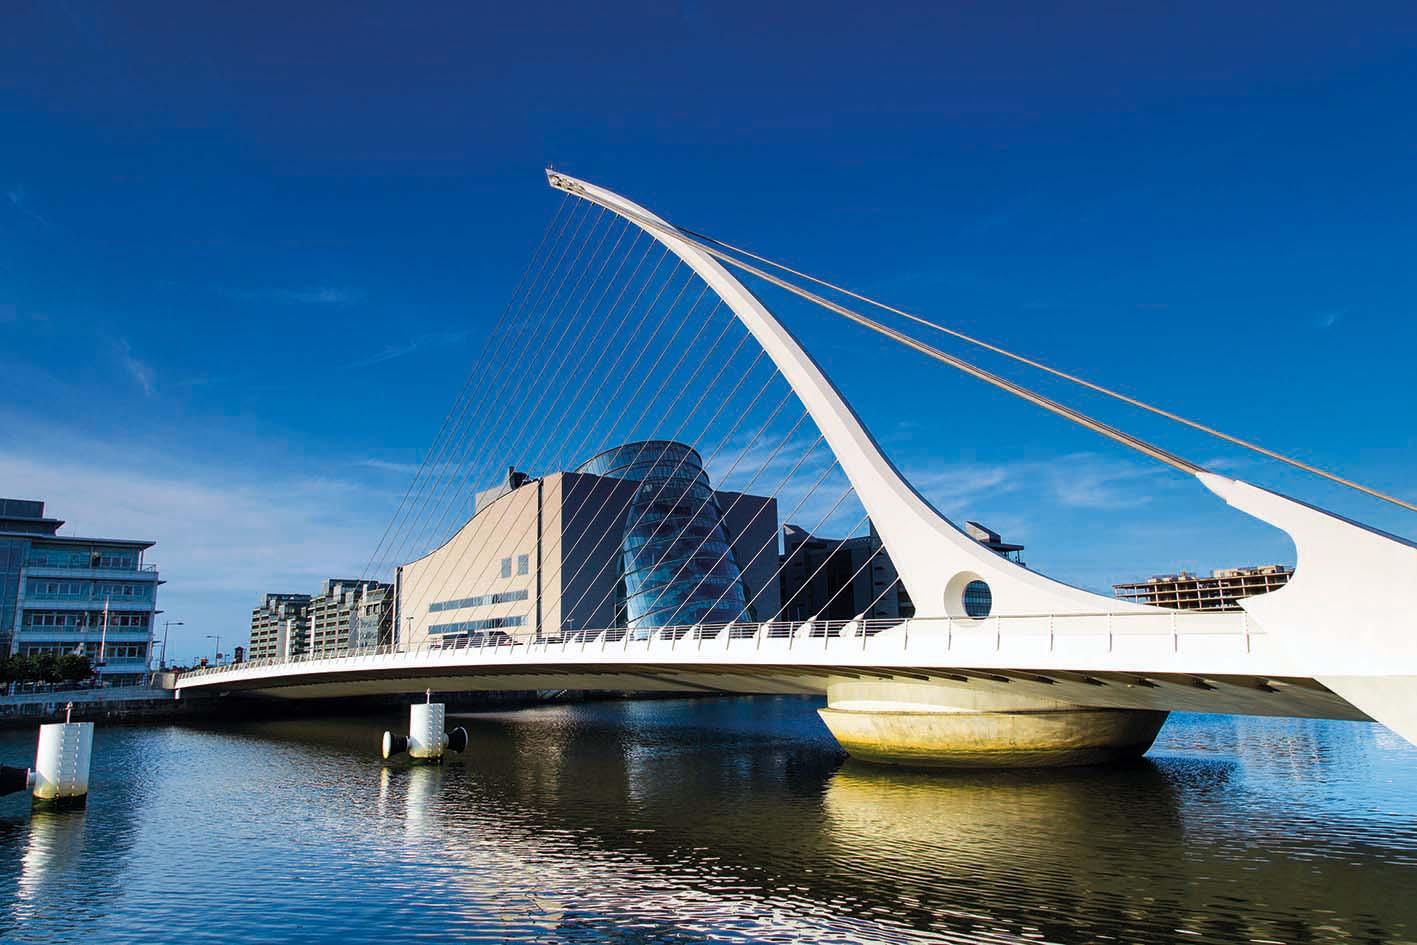 Galway & Dublino<br>National University of Ireland